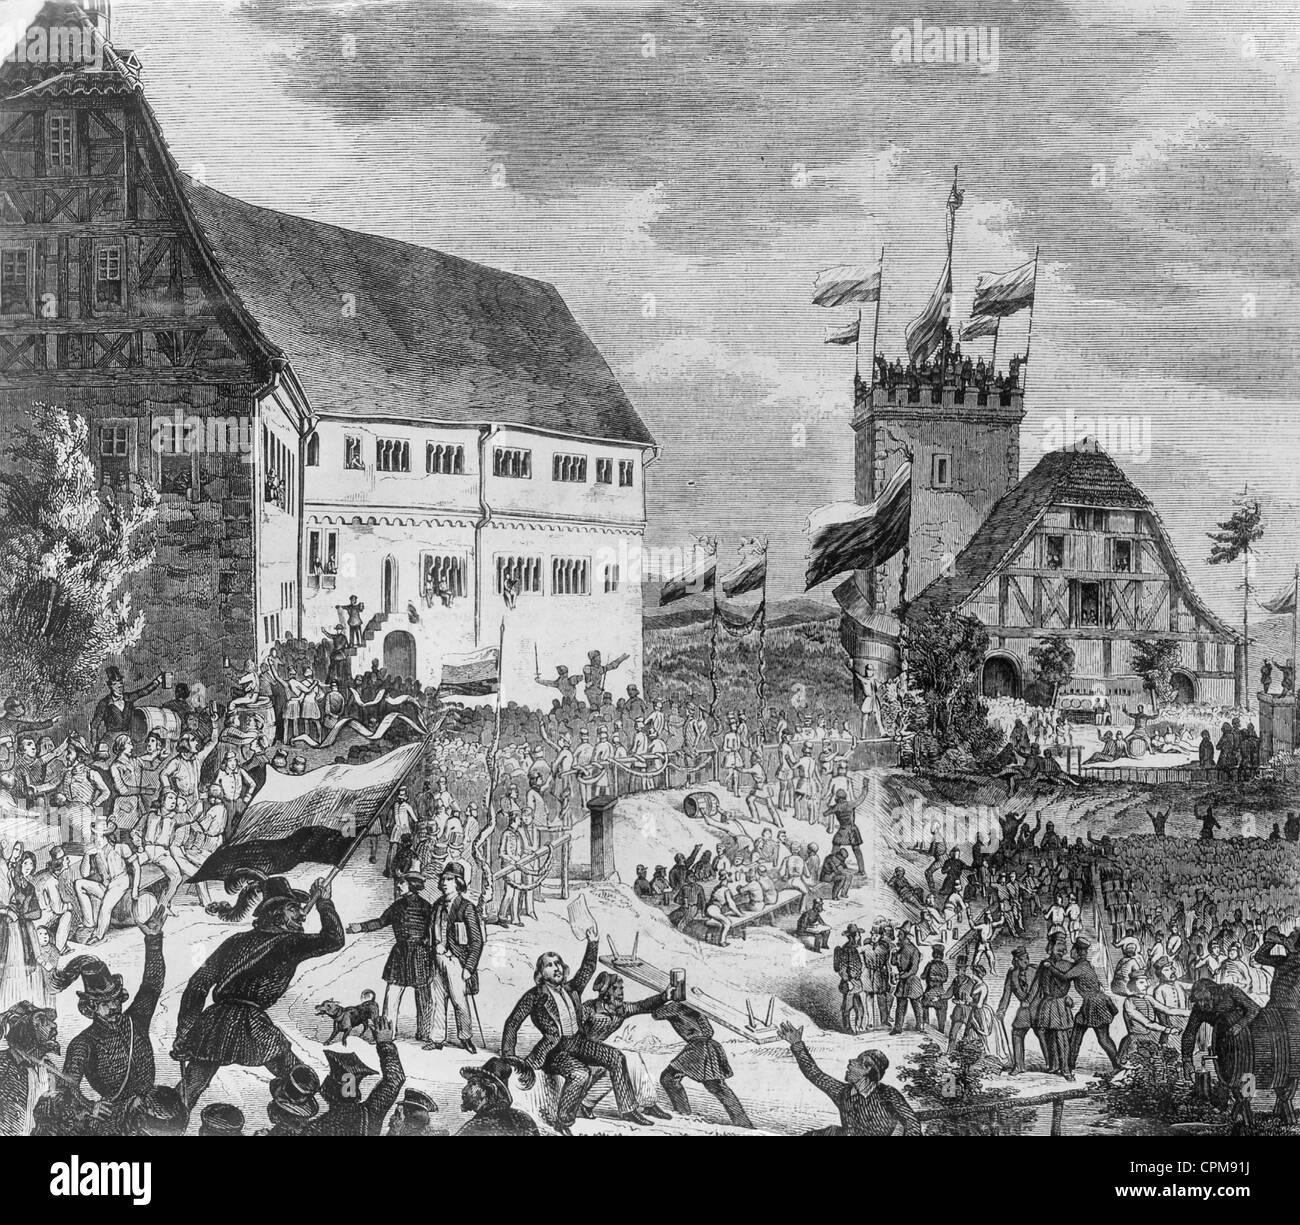 Wartburg festival, 1817